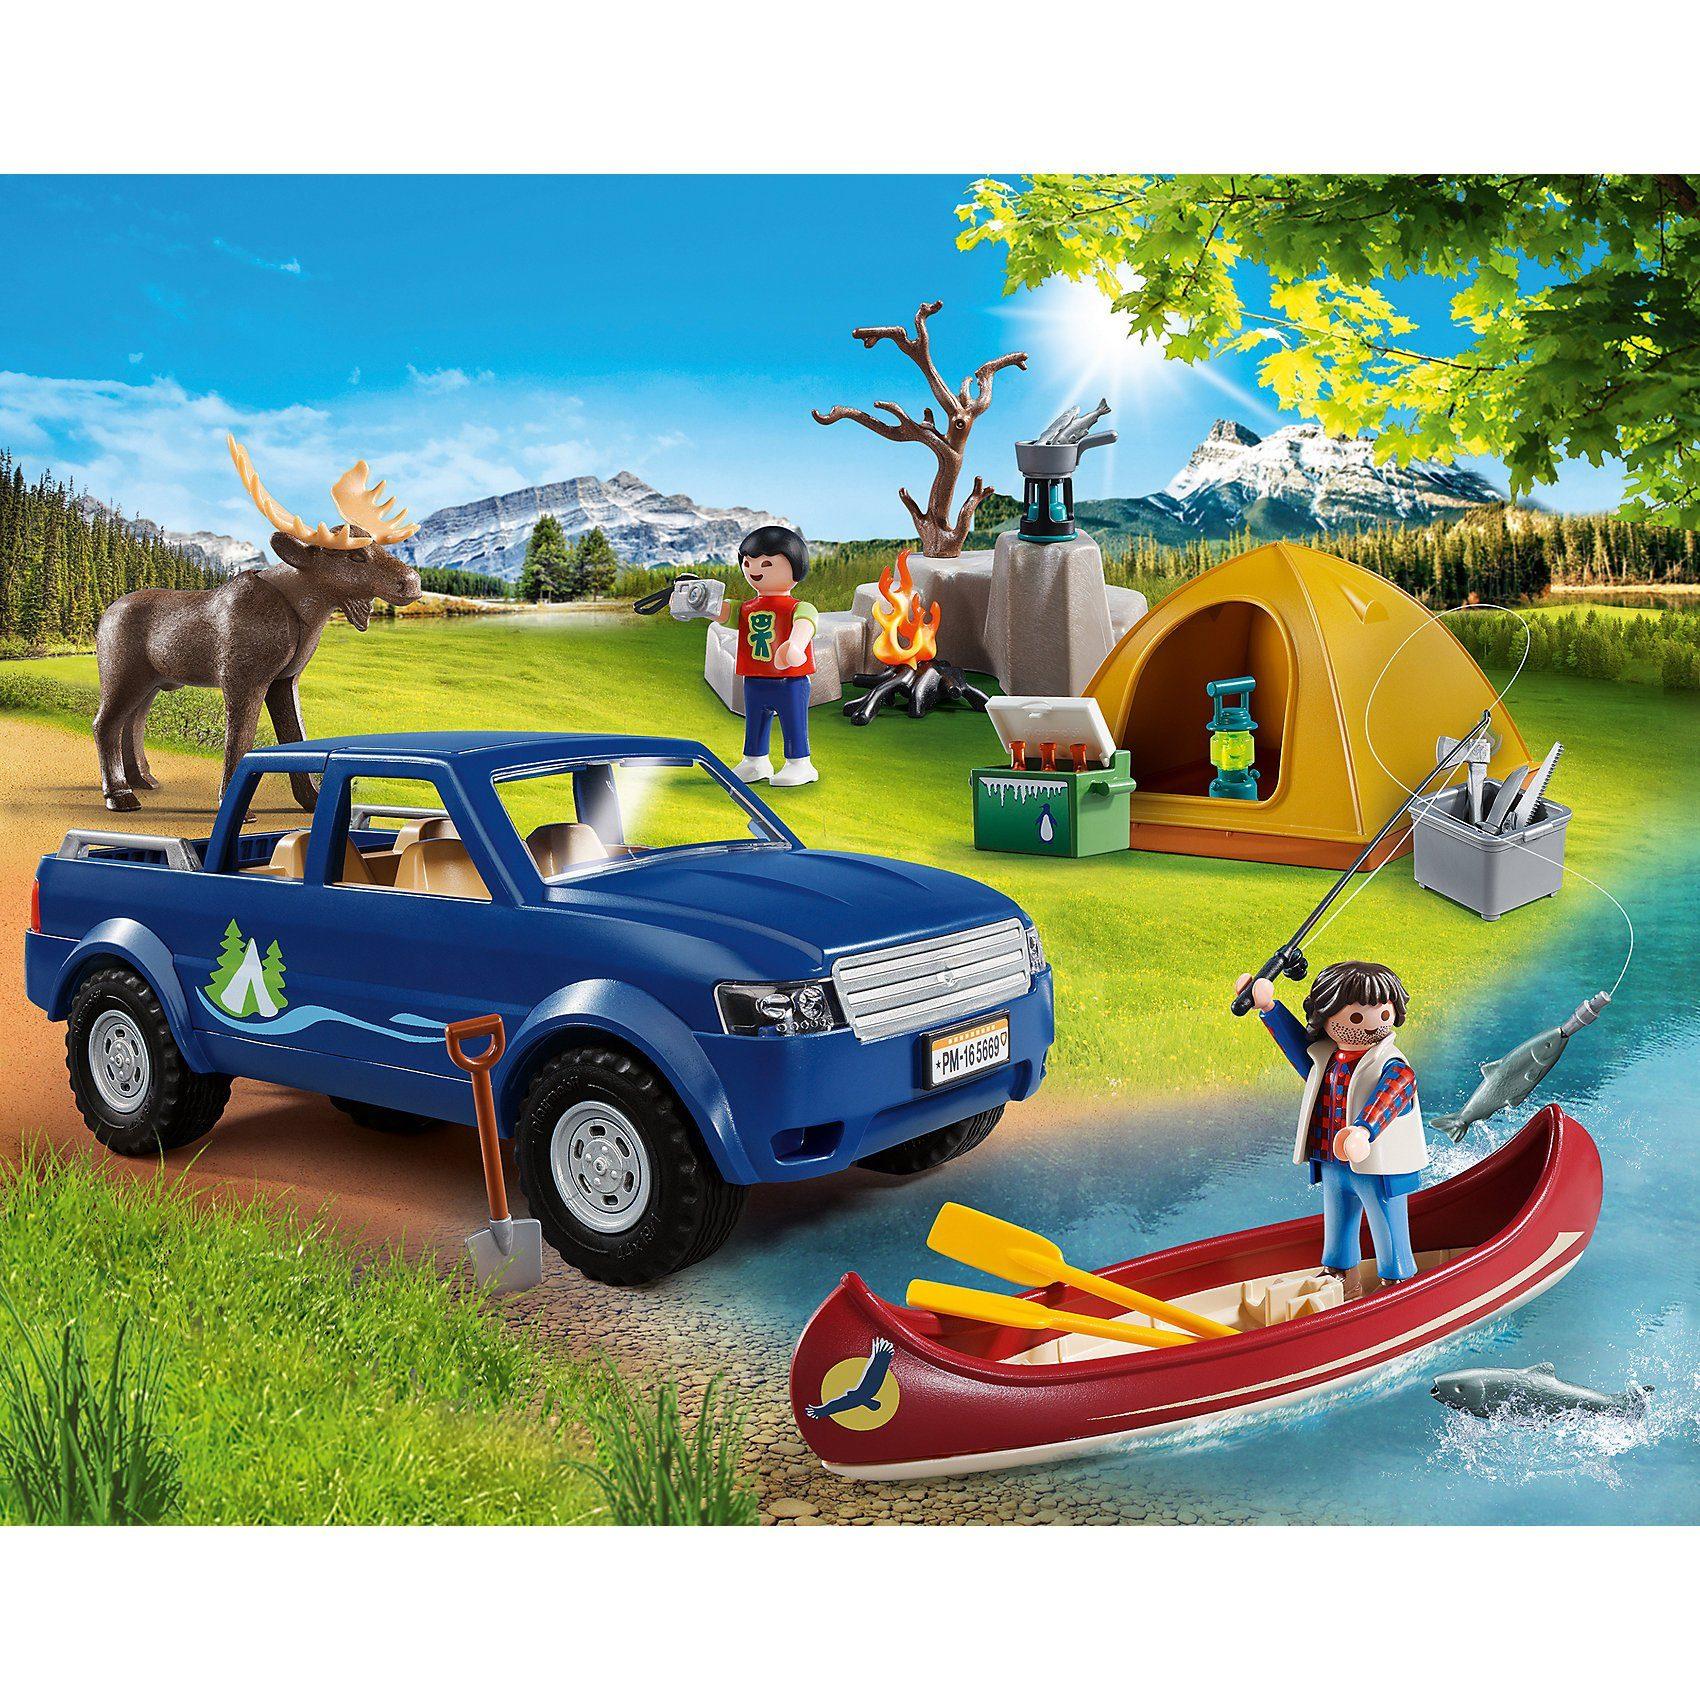 Playmobil® 5669 Campingausflug mit Pick up